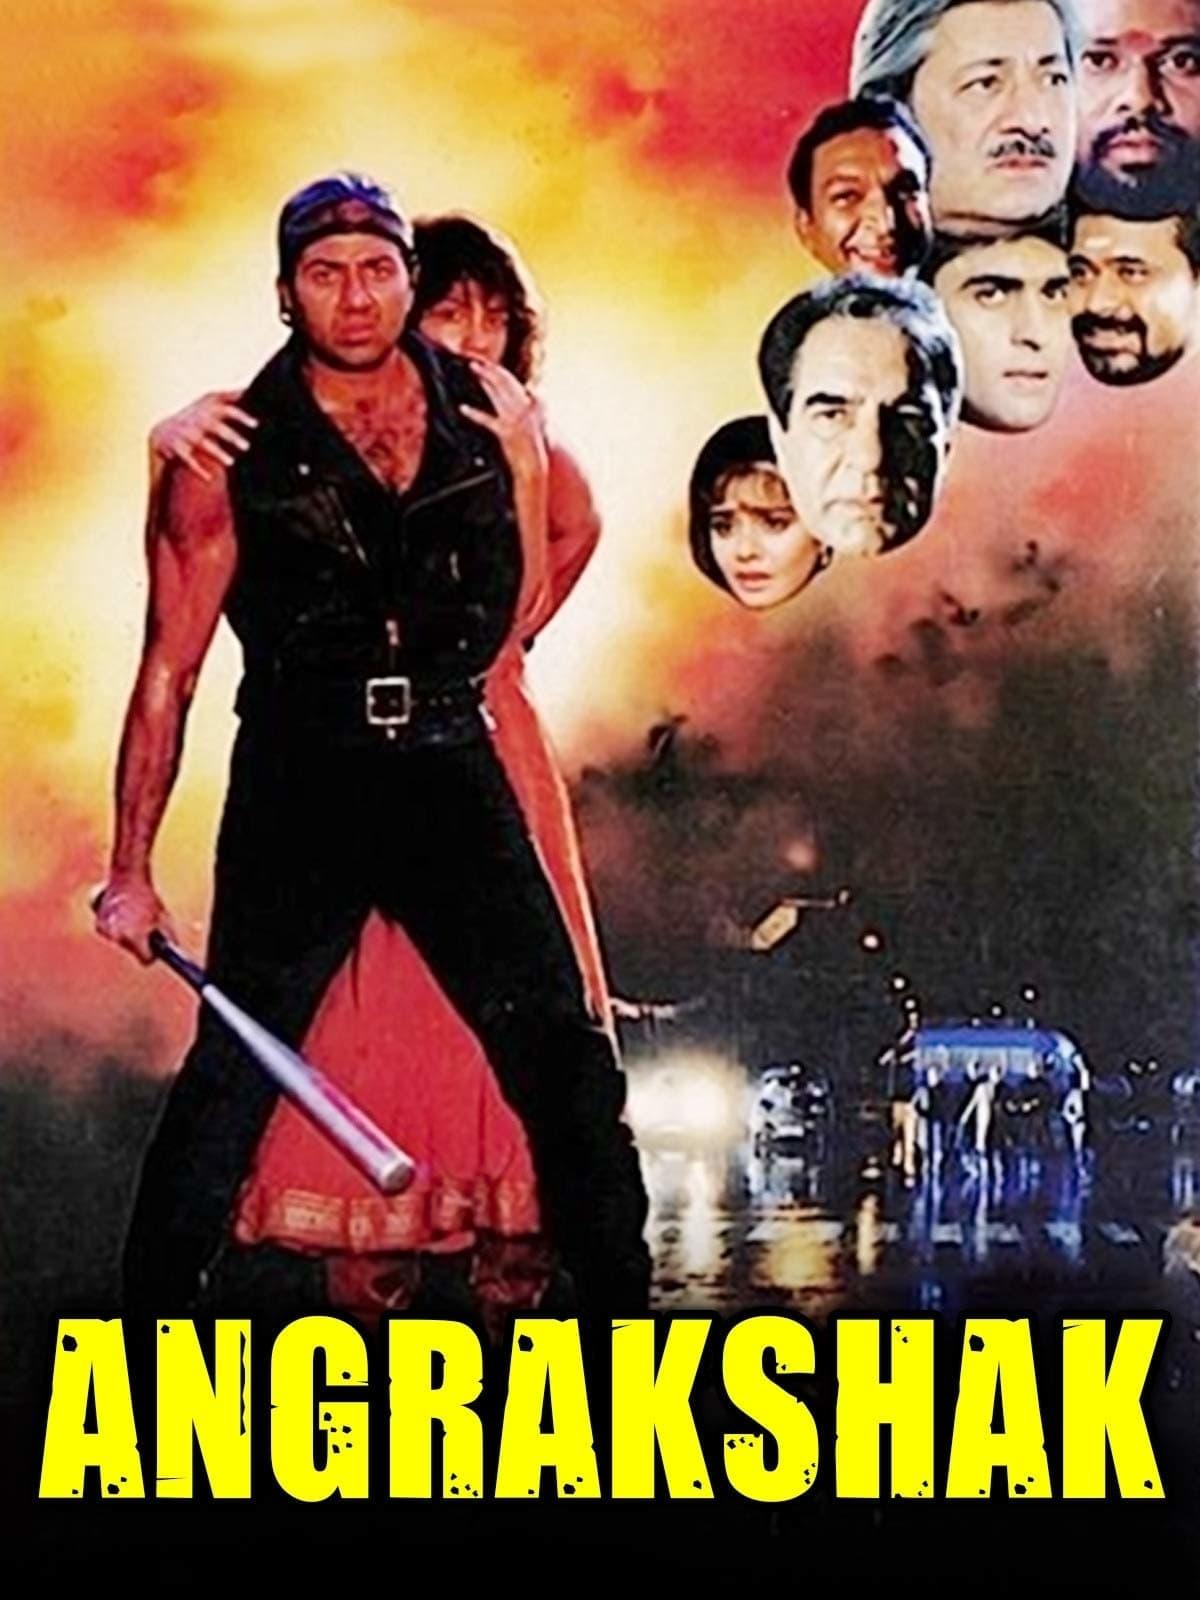 Angrakshak